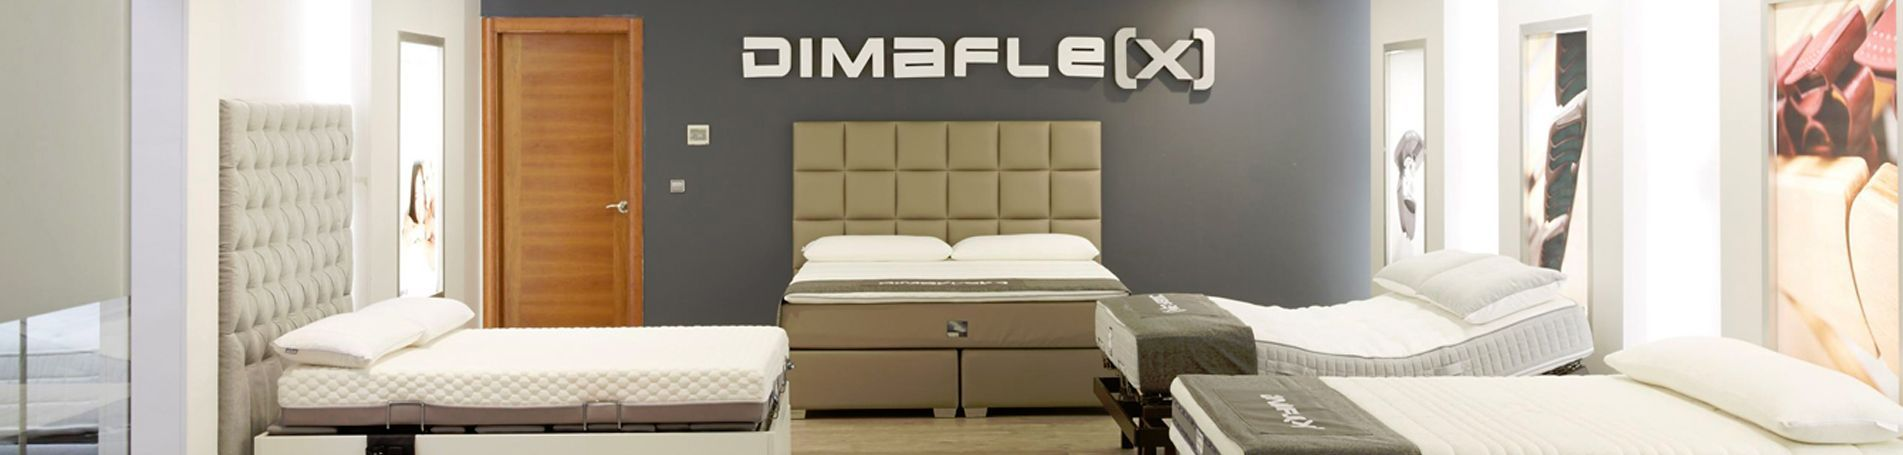 Marketing Management Outsourcing para Dimaflex